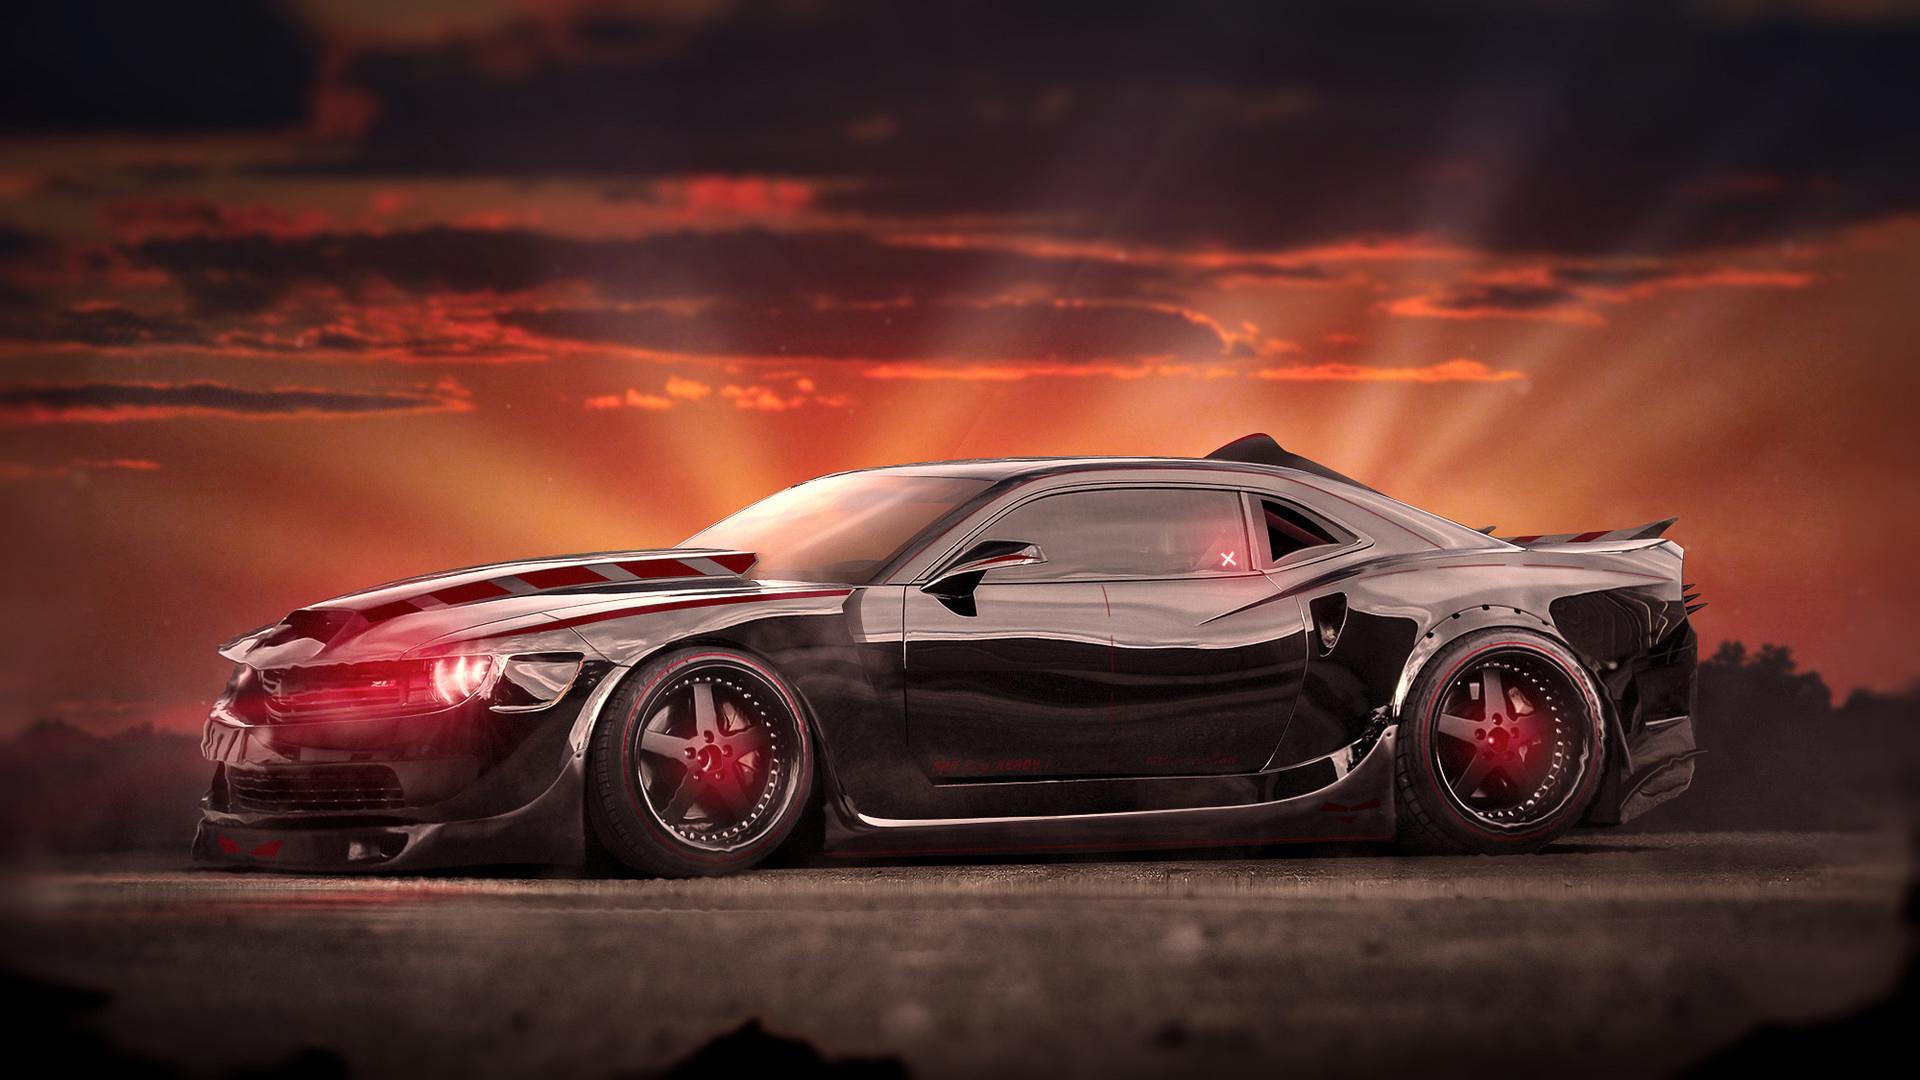 Evil Chevrolet Camaro Muscle Car Wallpaper  Hd Car